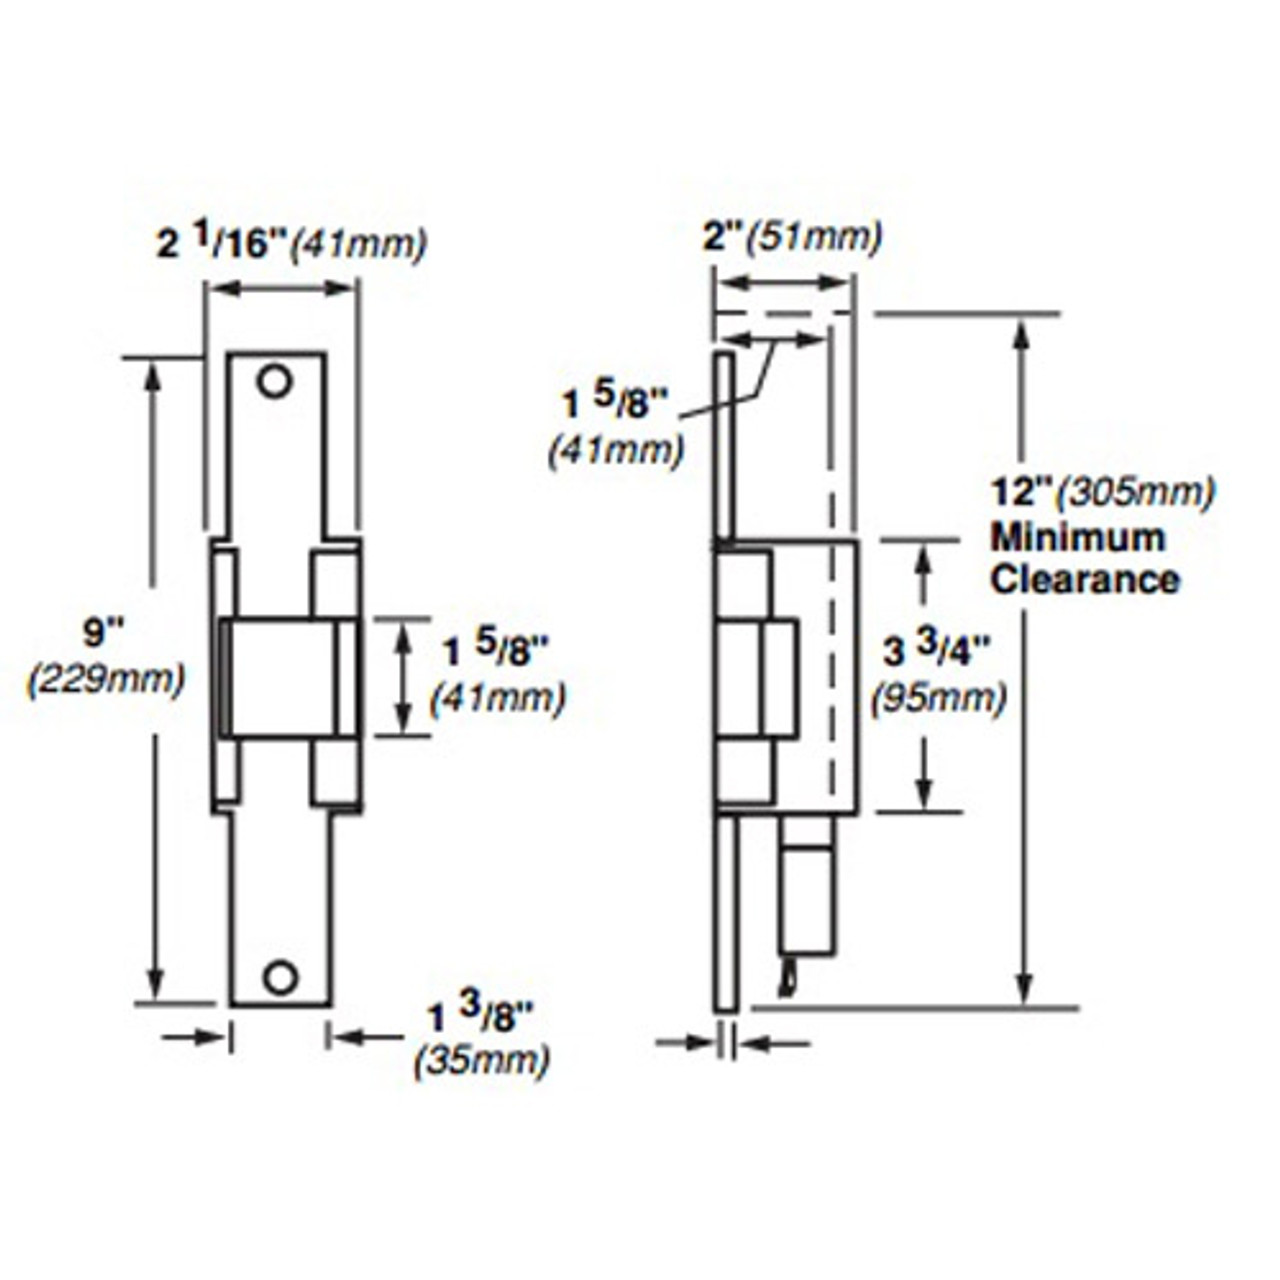 6222-12VDC-US10B Von Duprin Electric Strike for Mortise or Cylindrical Locksets in Dark Bronze Finish